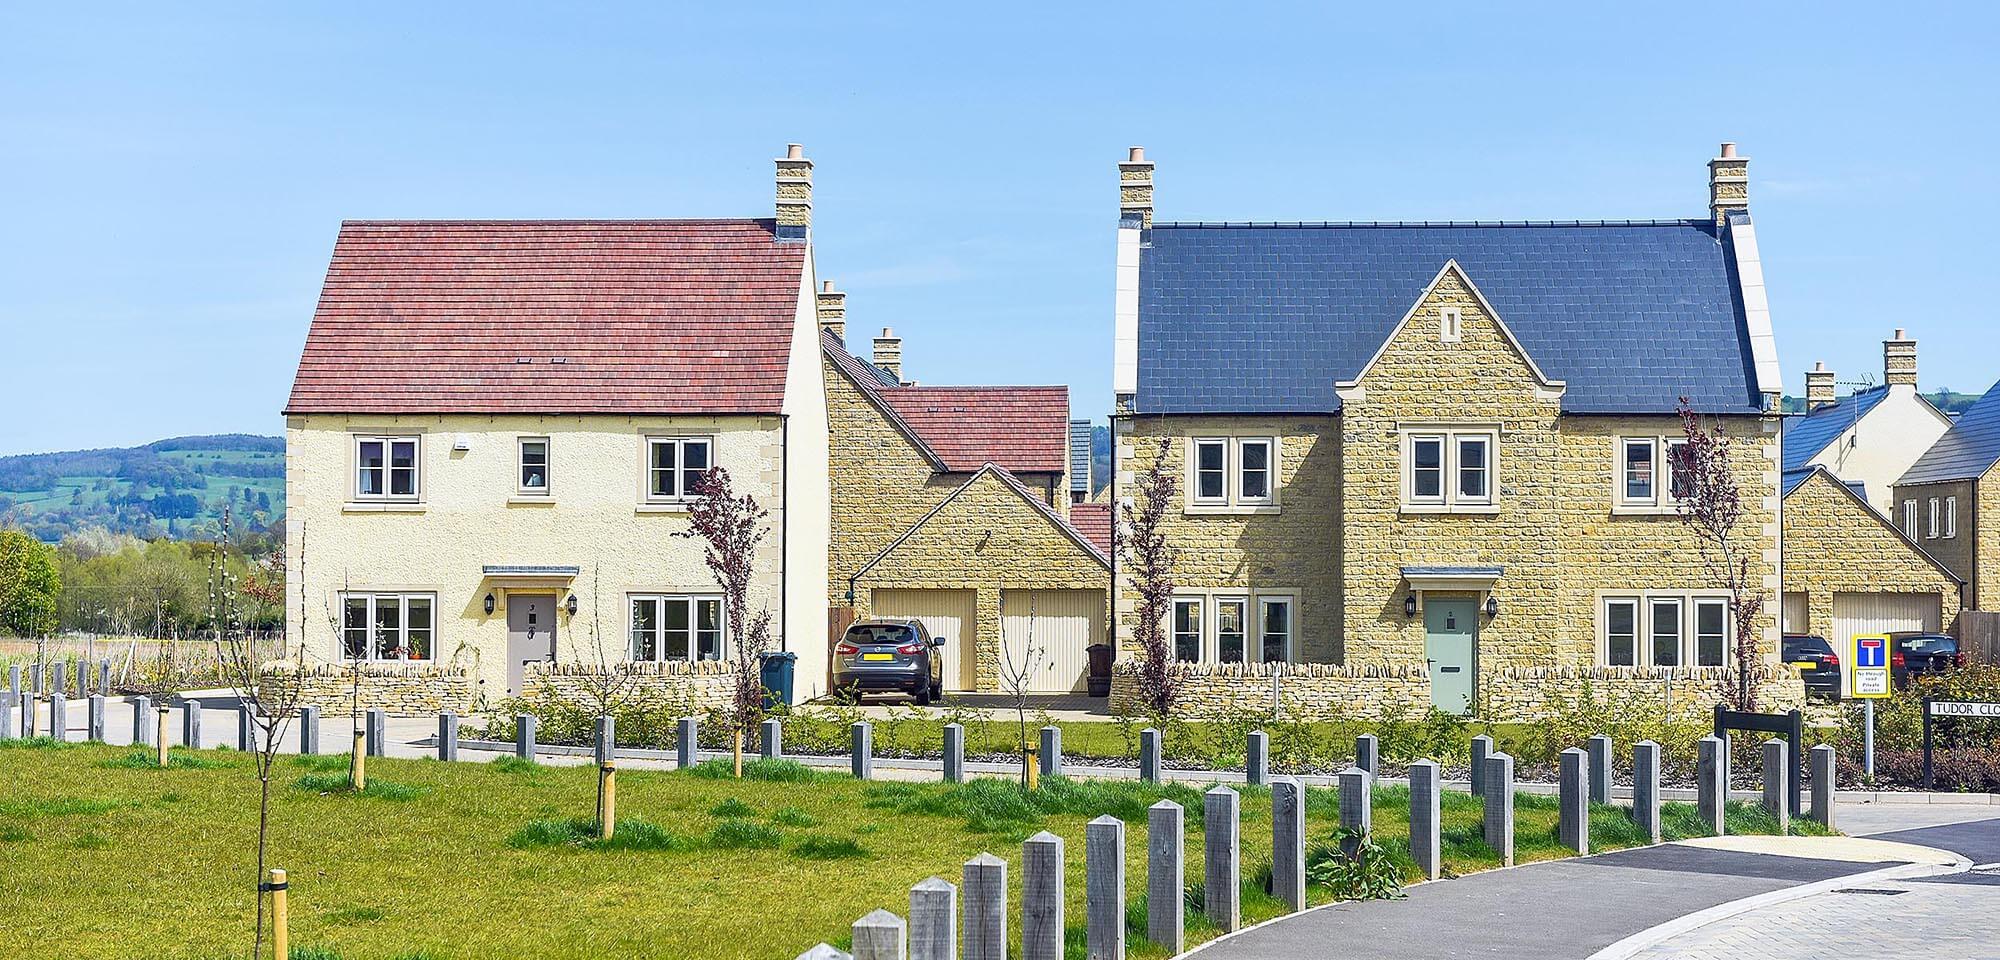 Housing strategy